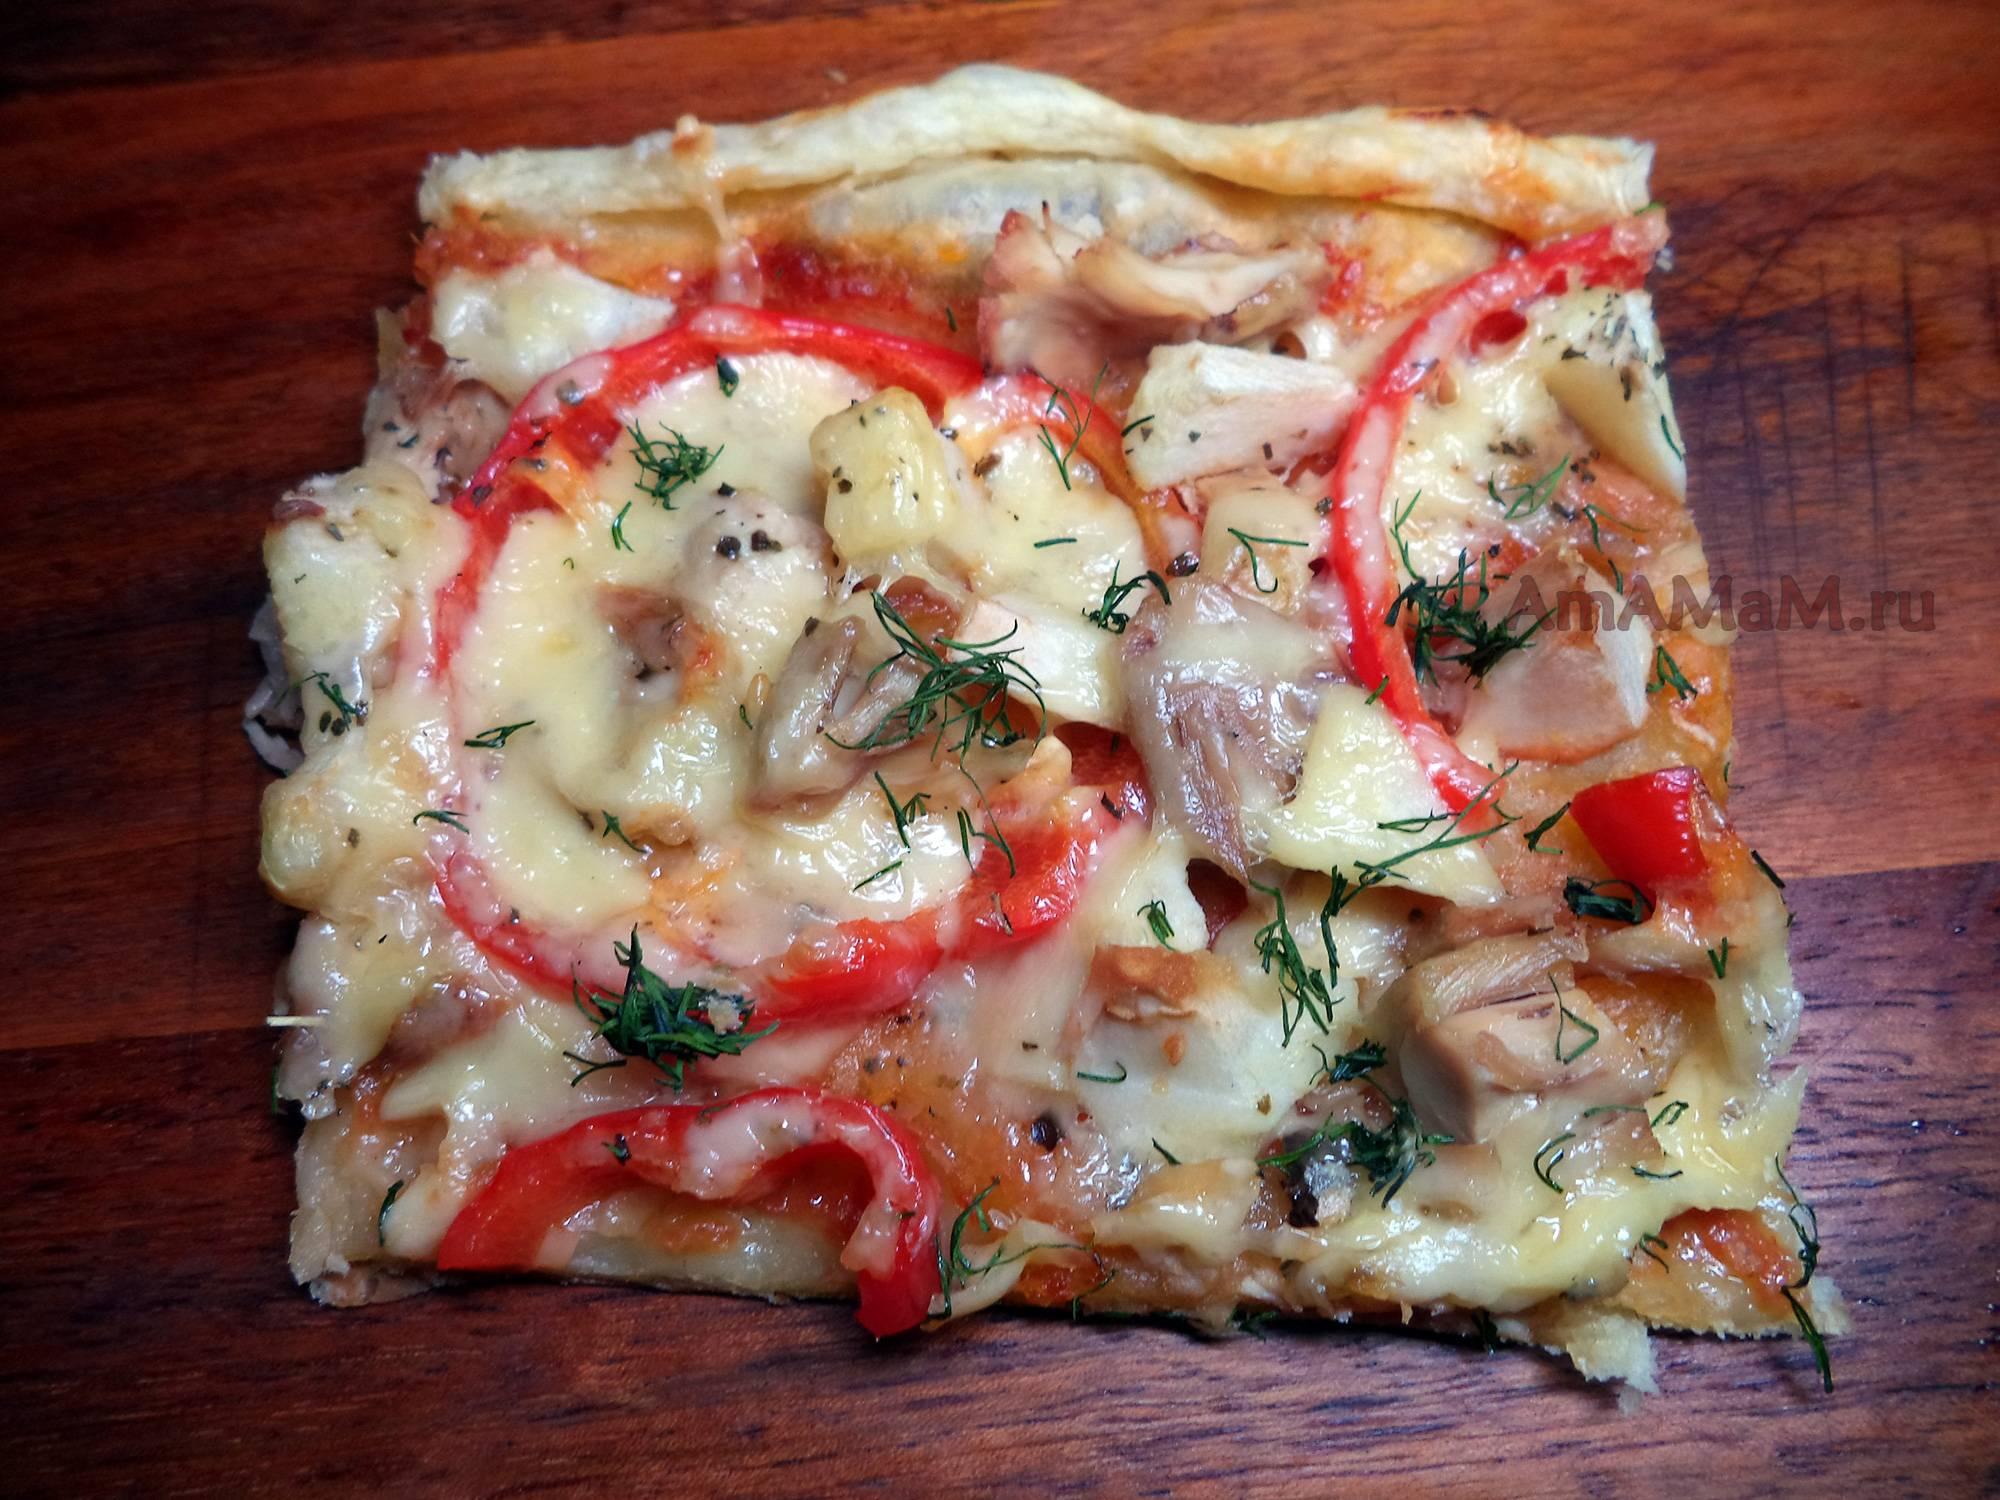 Мясная пицца с моцареллой - рецепты джуренко